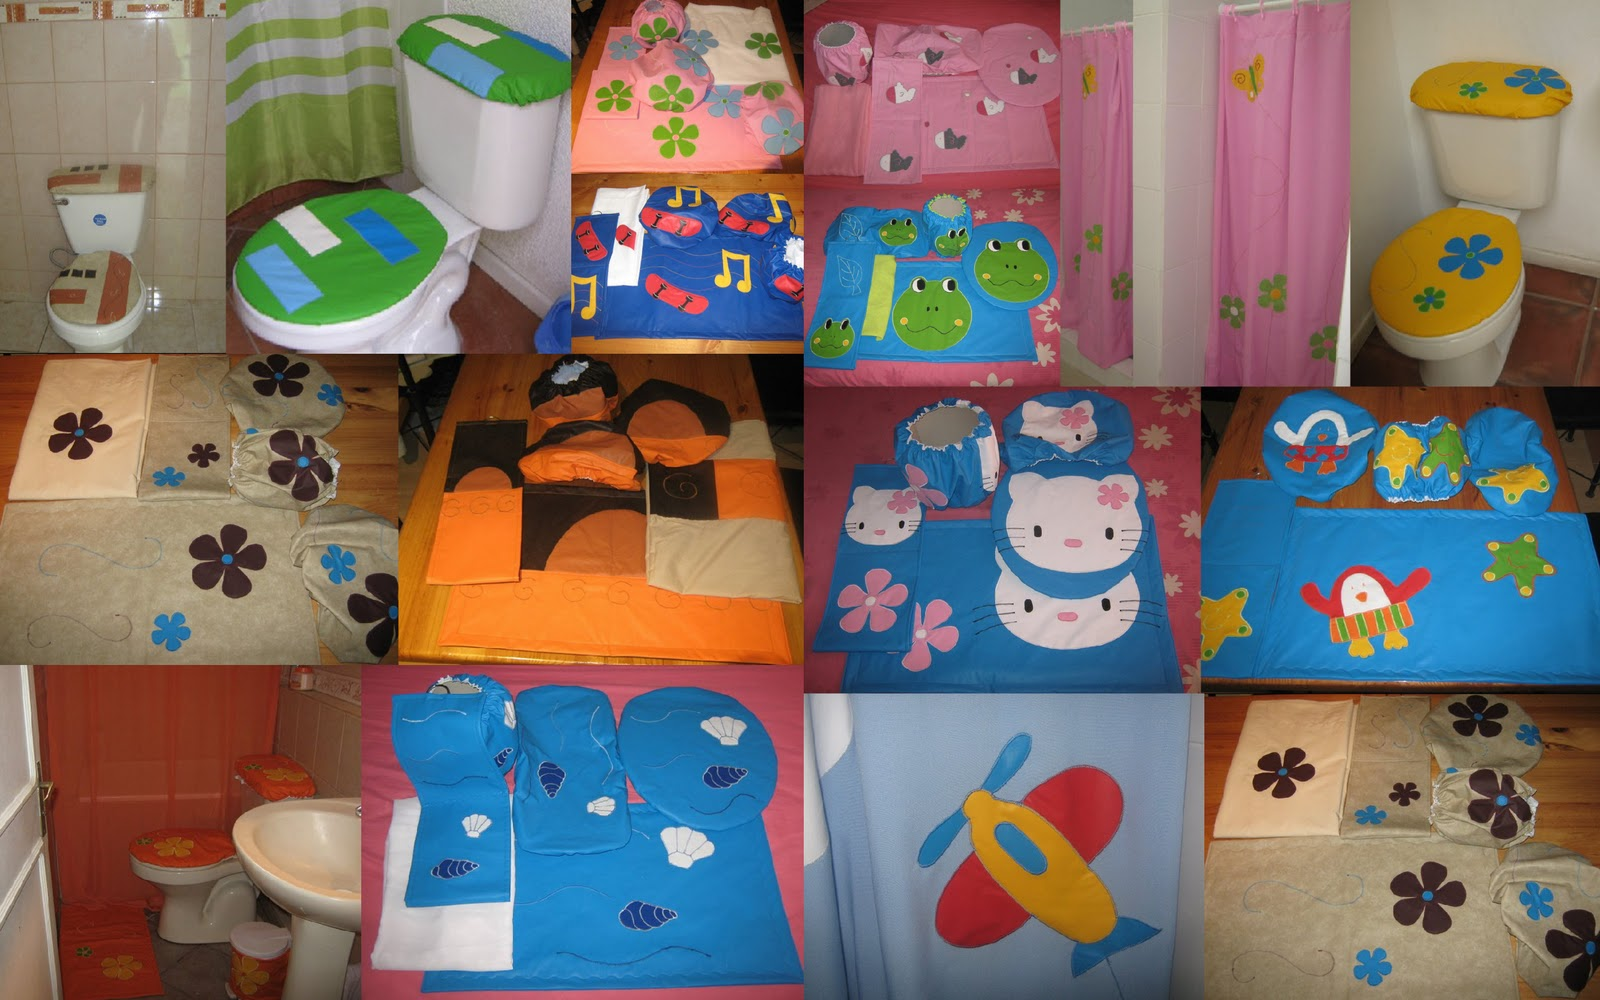 Baño Cancion Infantil:rollos papel higienico cortina de baño alfombra salida de baño http